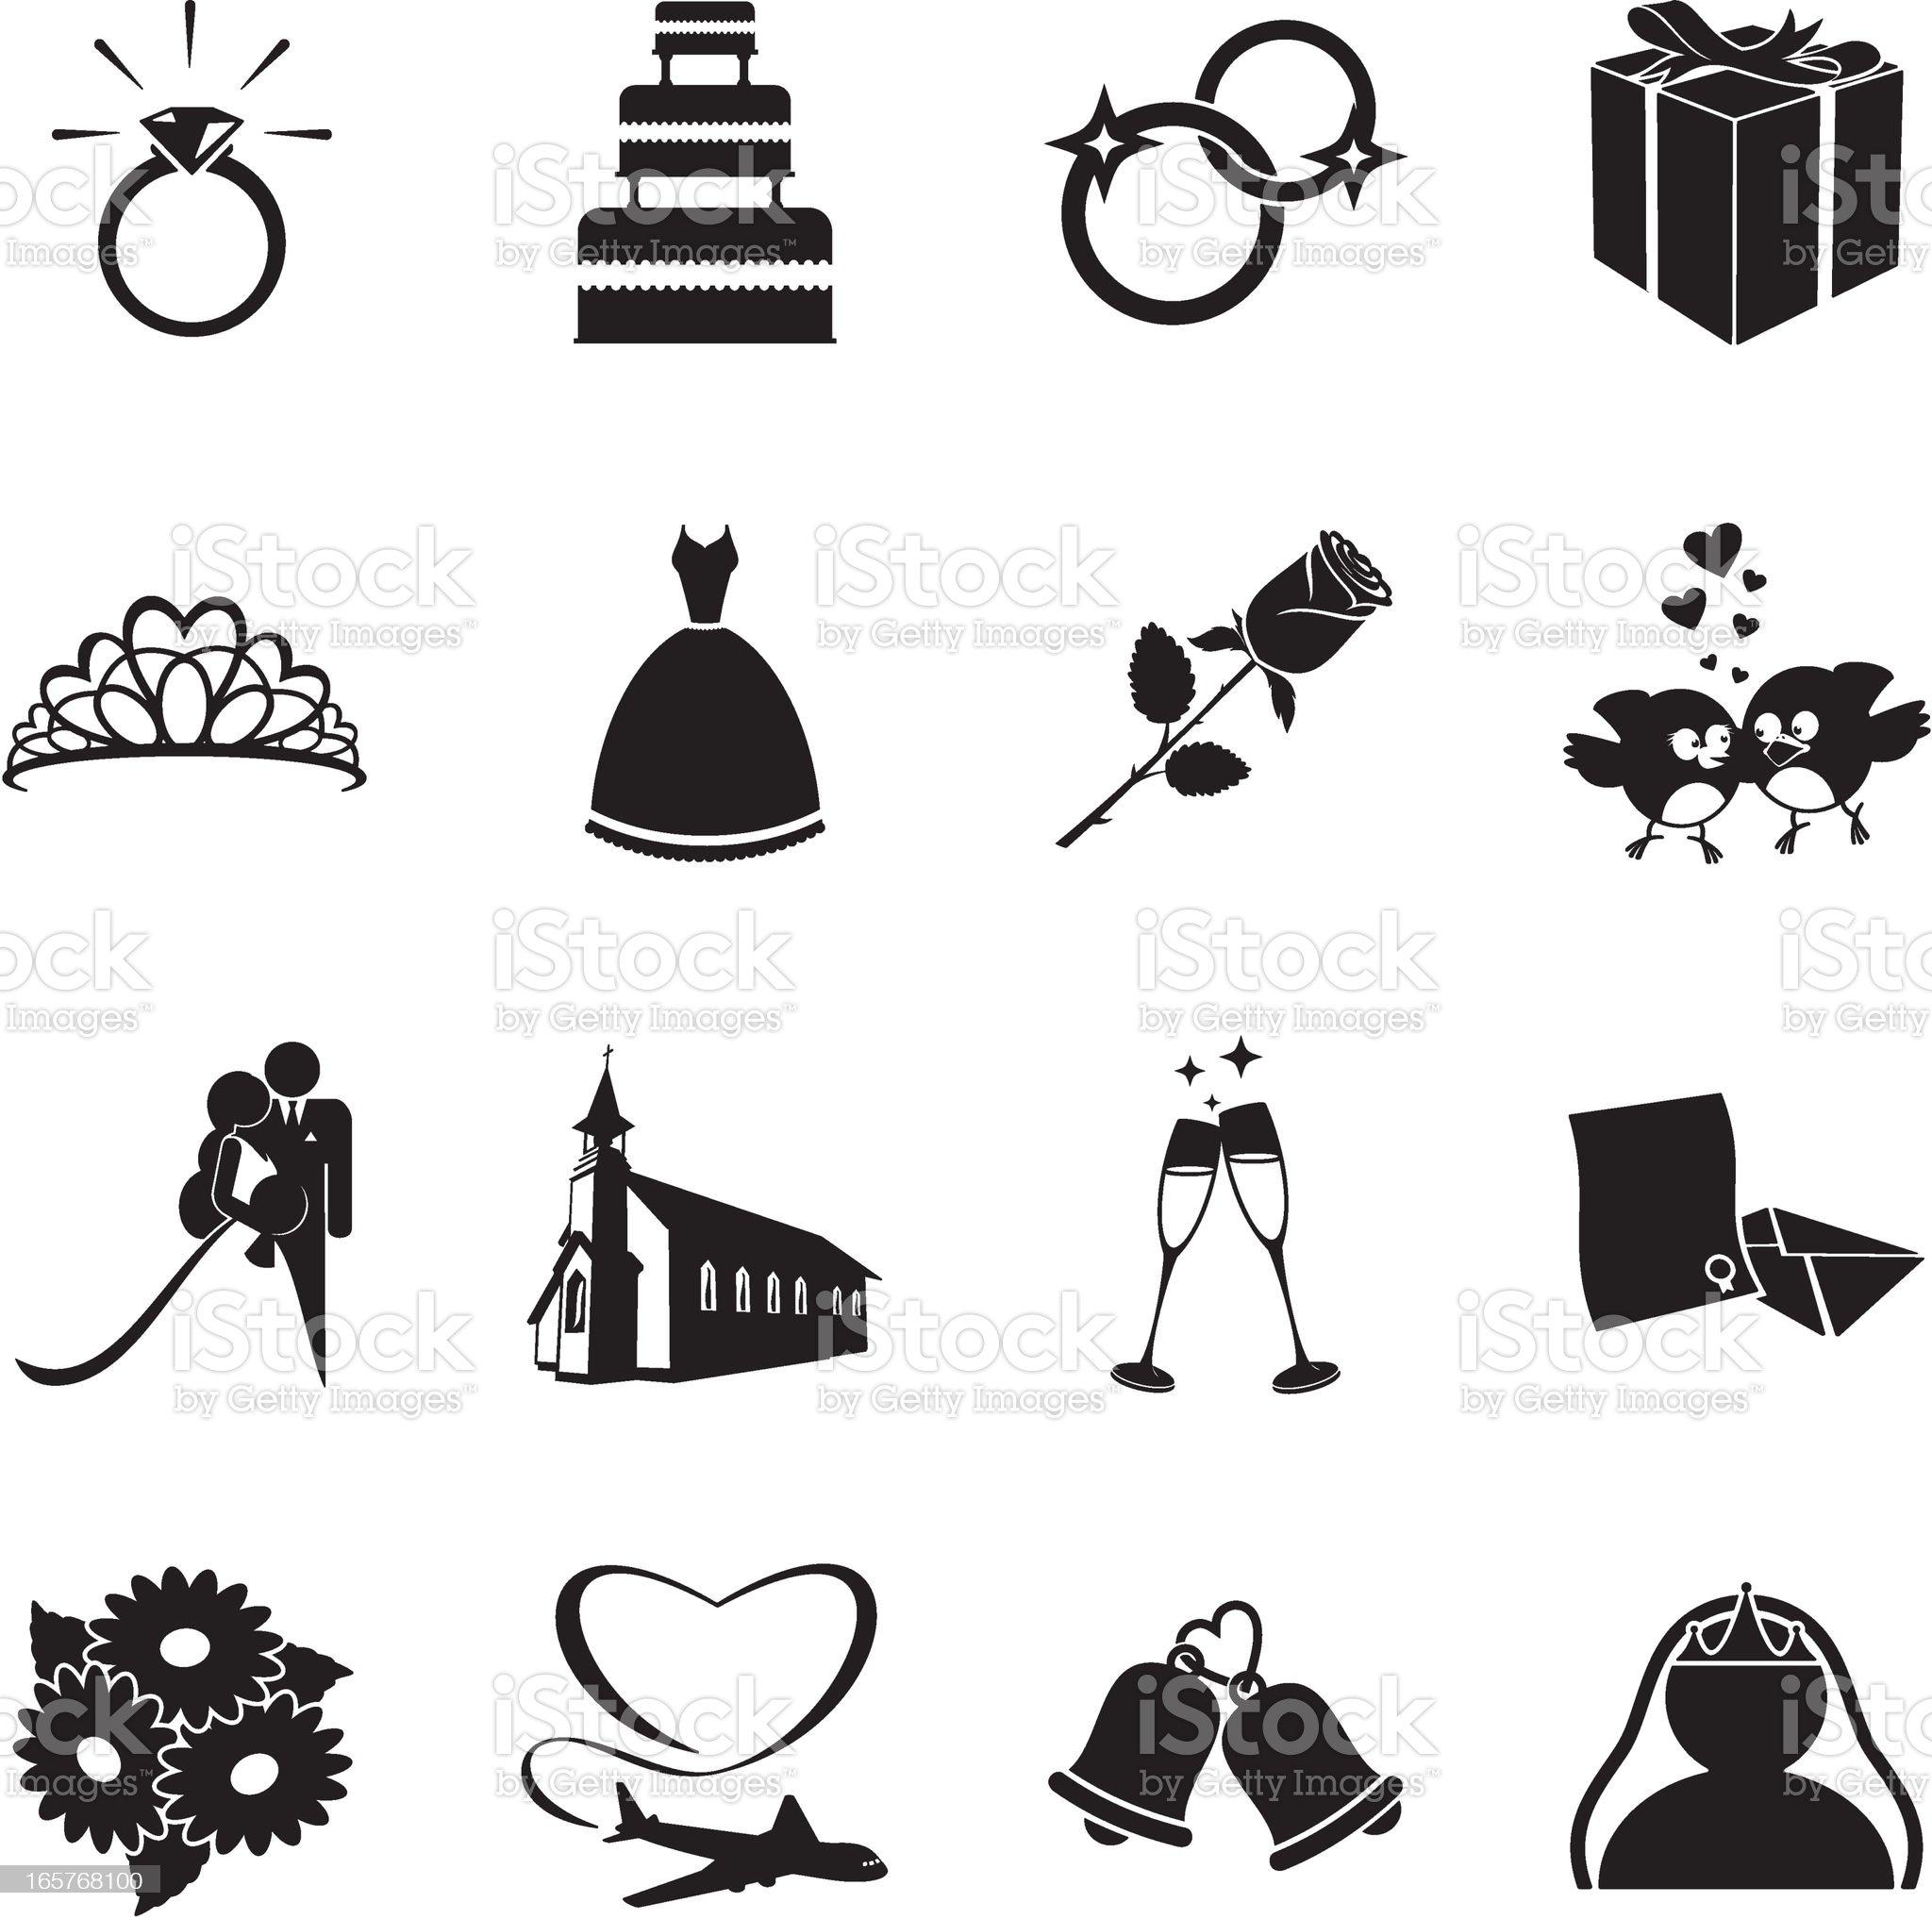 Wedding Icons royalty-free stock vector art